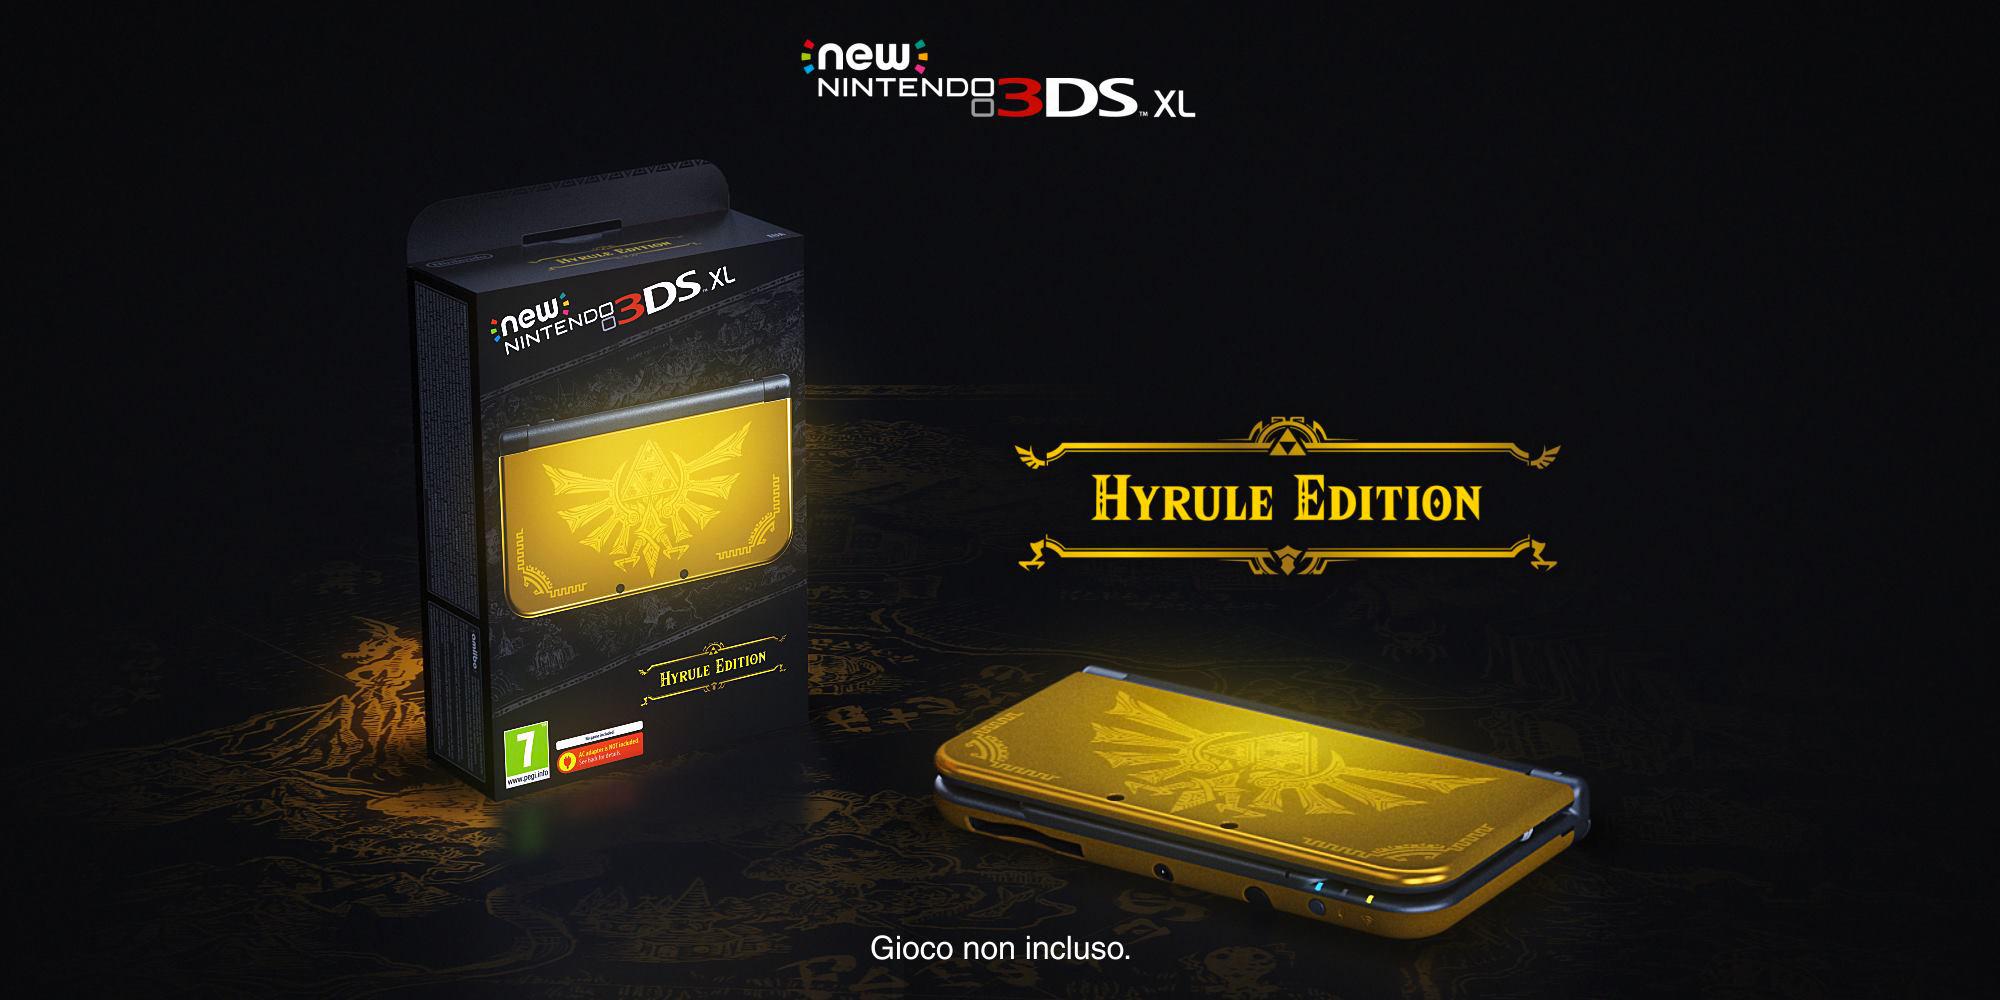 new-nintendo-3DS-XL-hyrule-edition